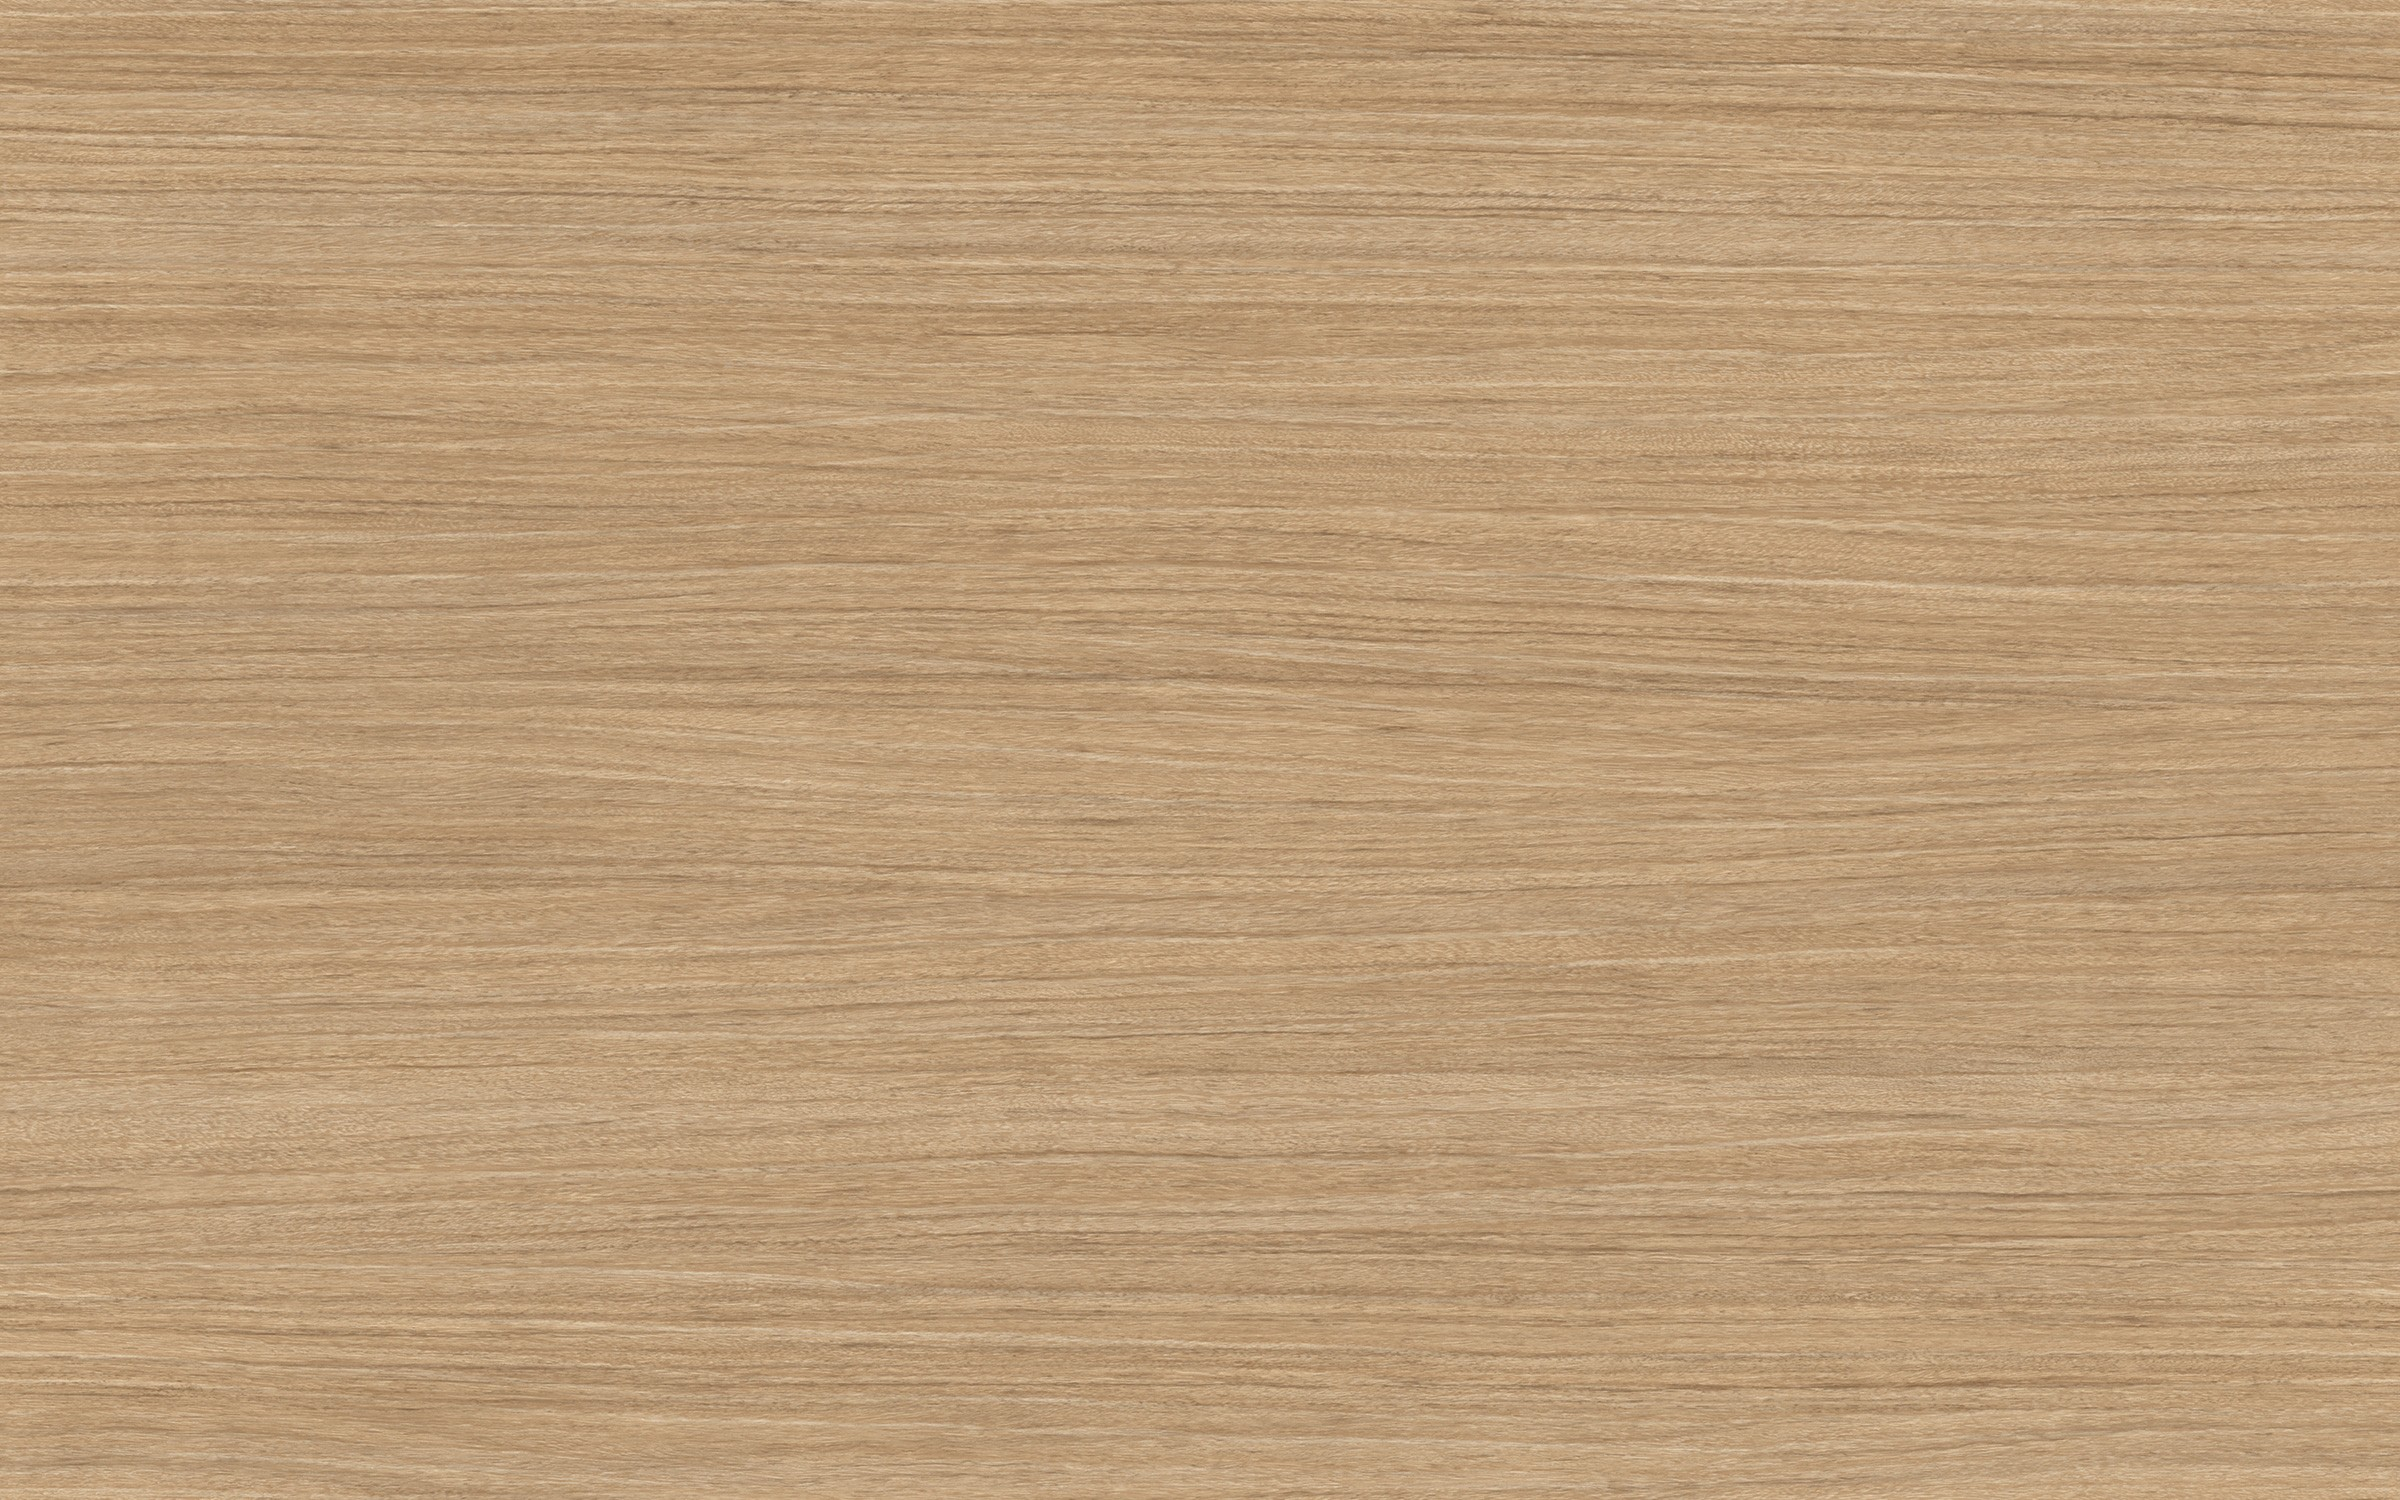 7981 Landmark Wood - Wilsonart